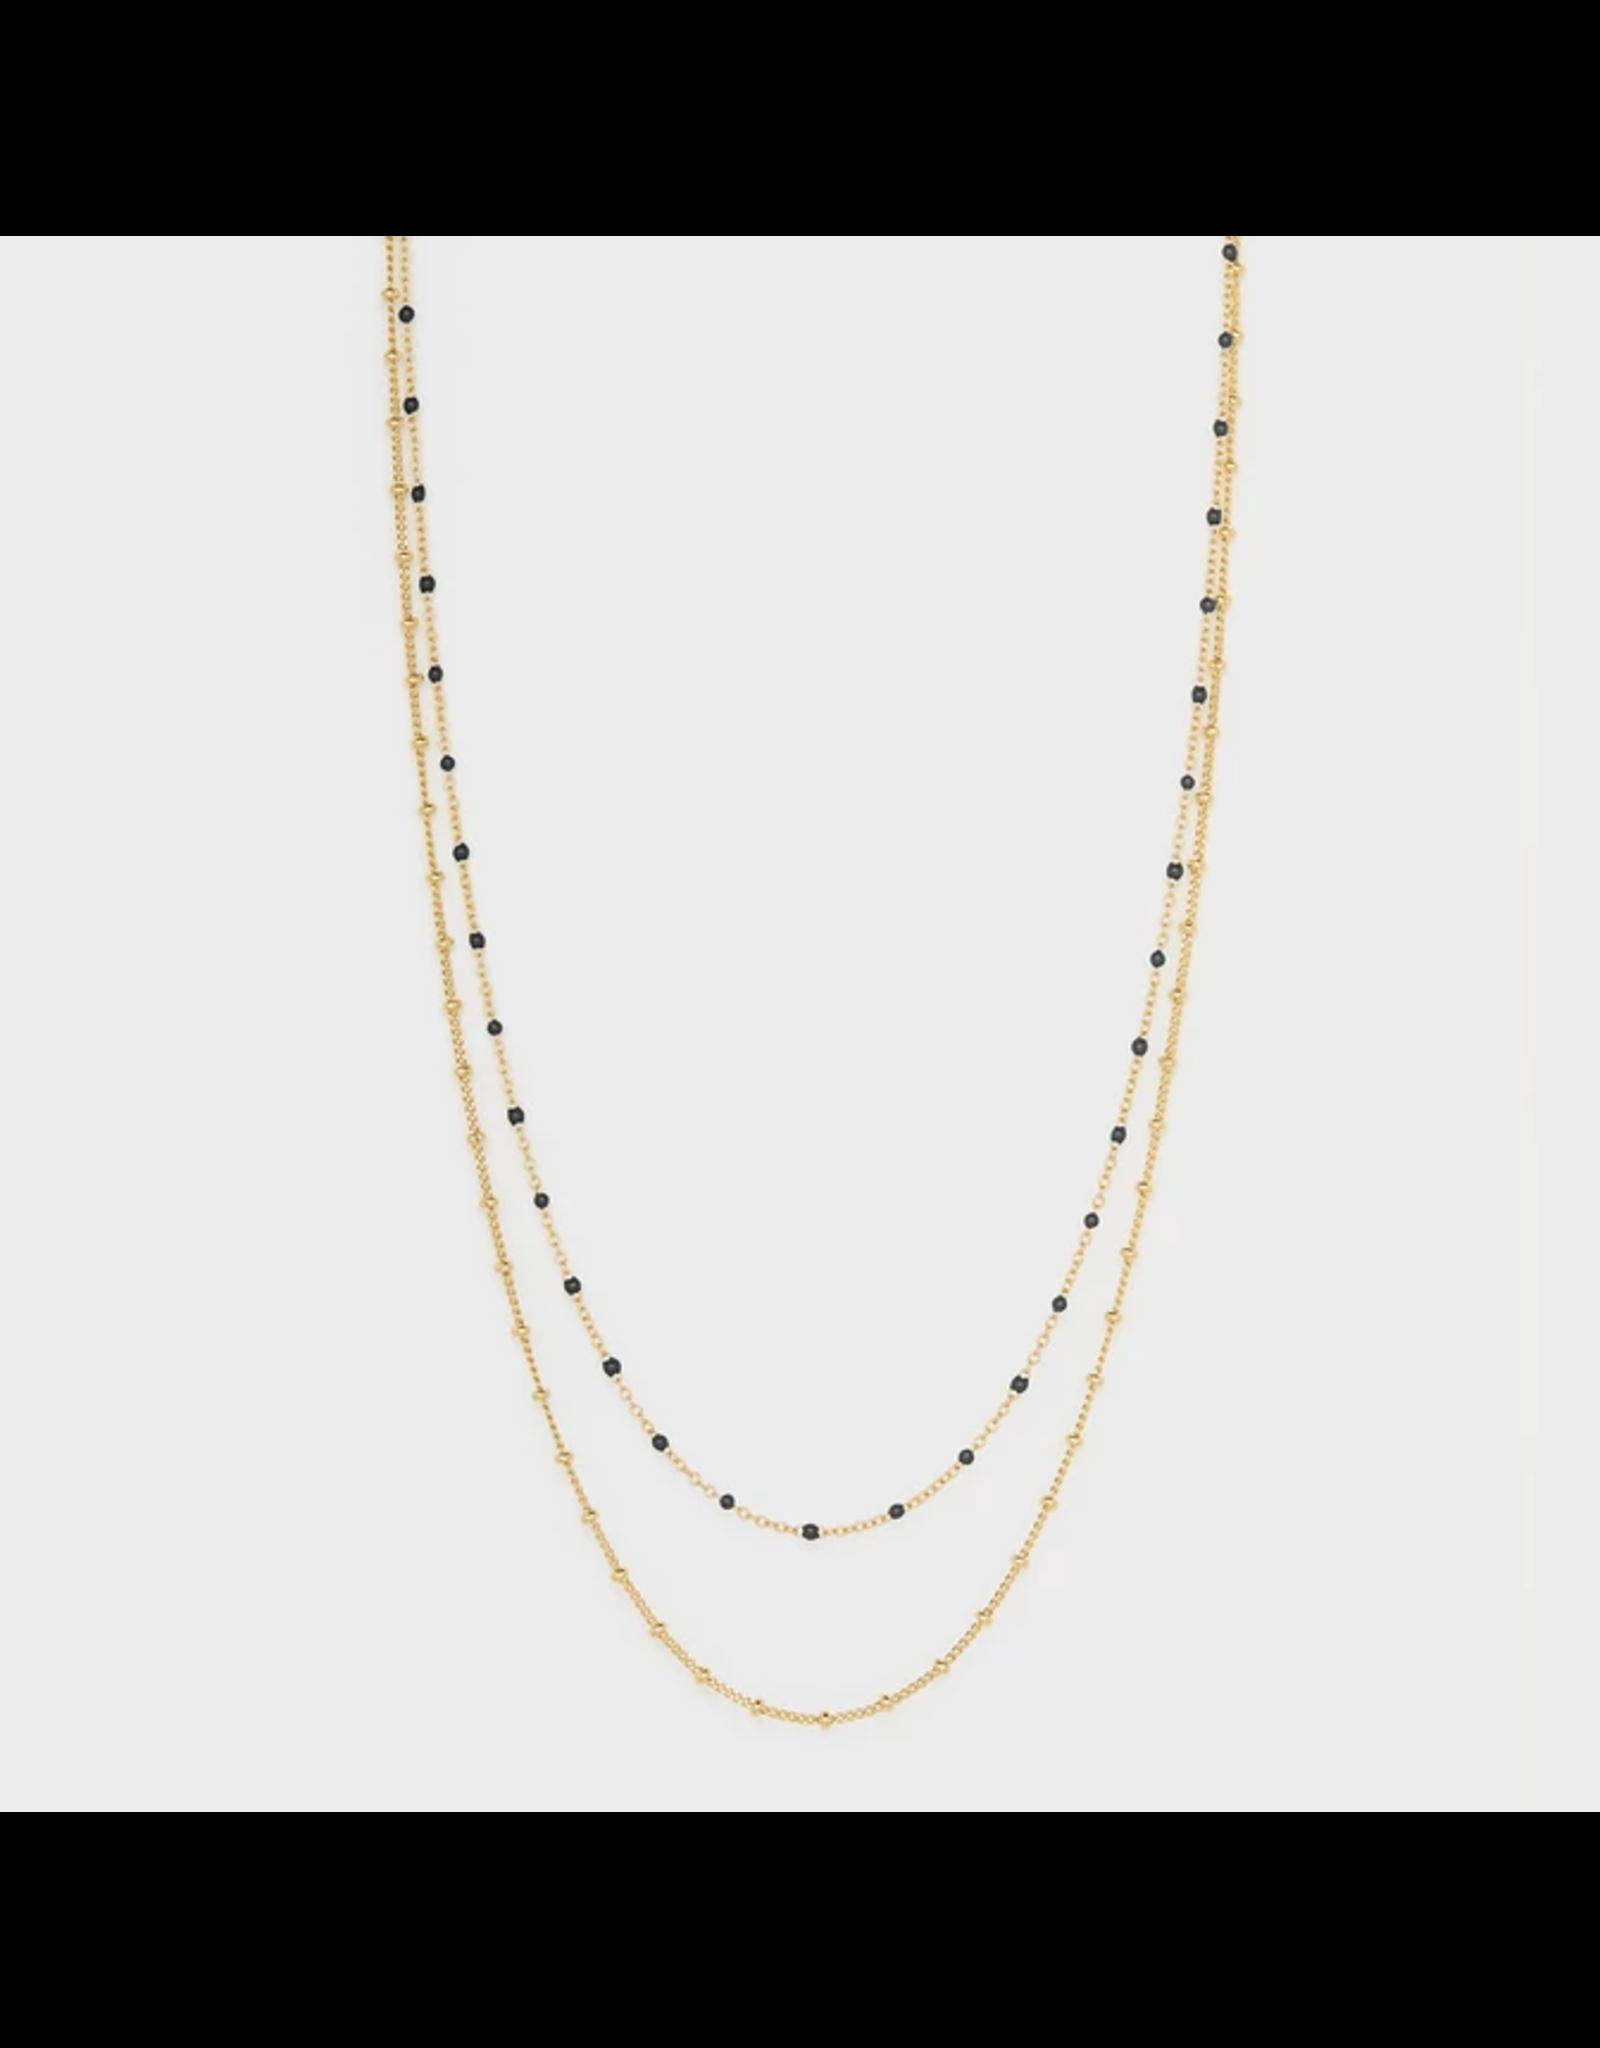 Capri Layered Necklace - black enamel